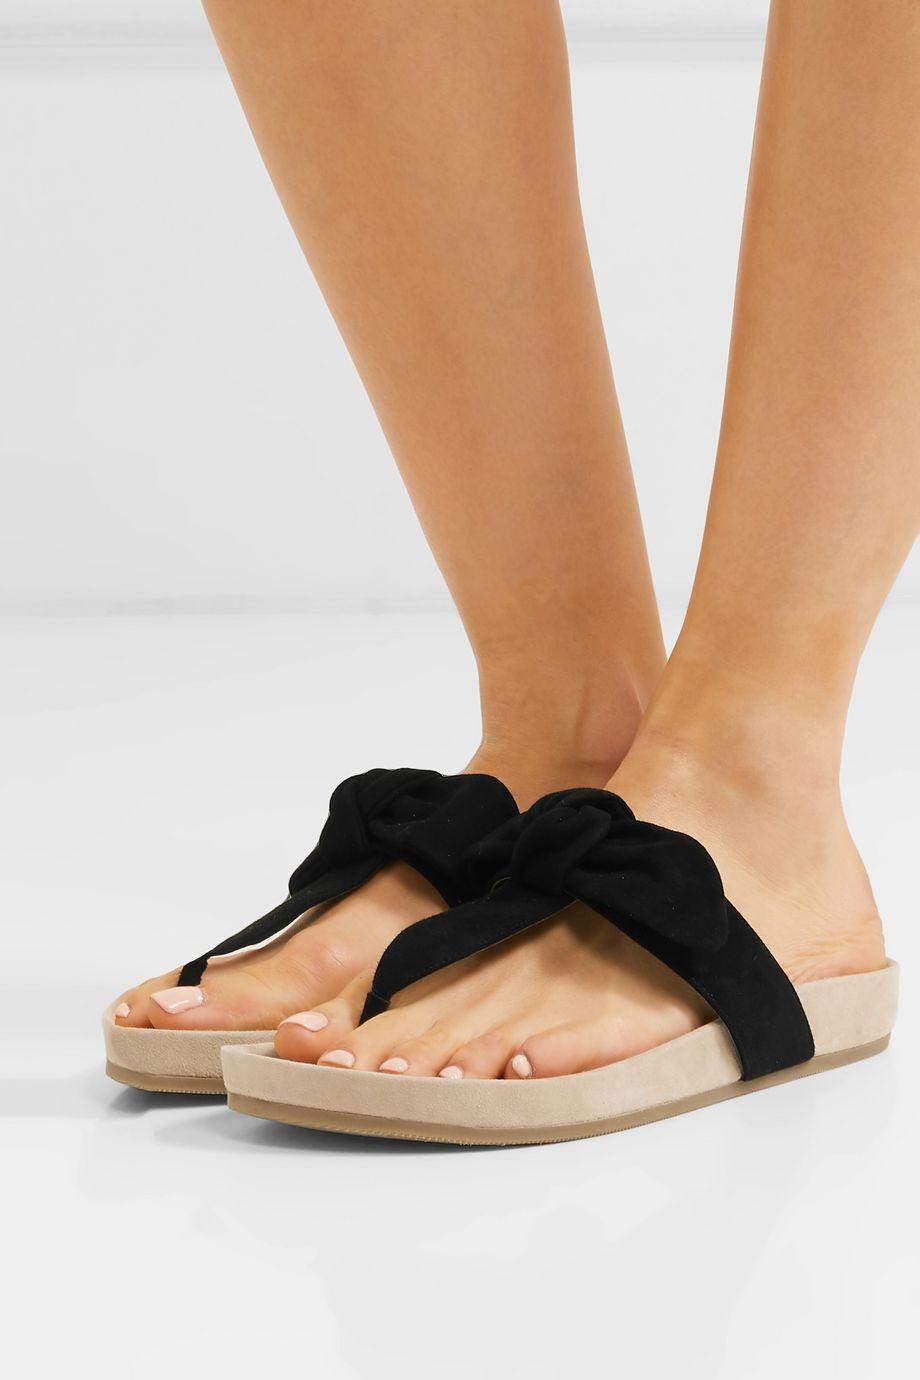 Loeffler Randall Adriana bow-detailed suede sandals